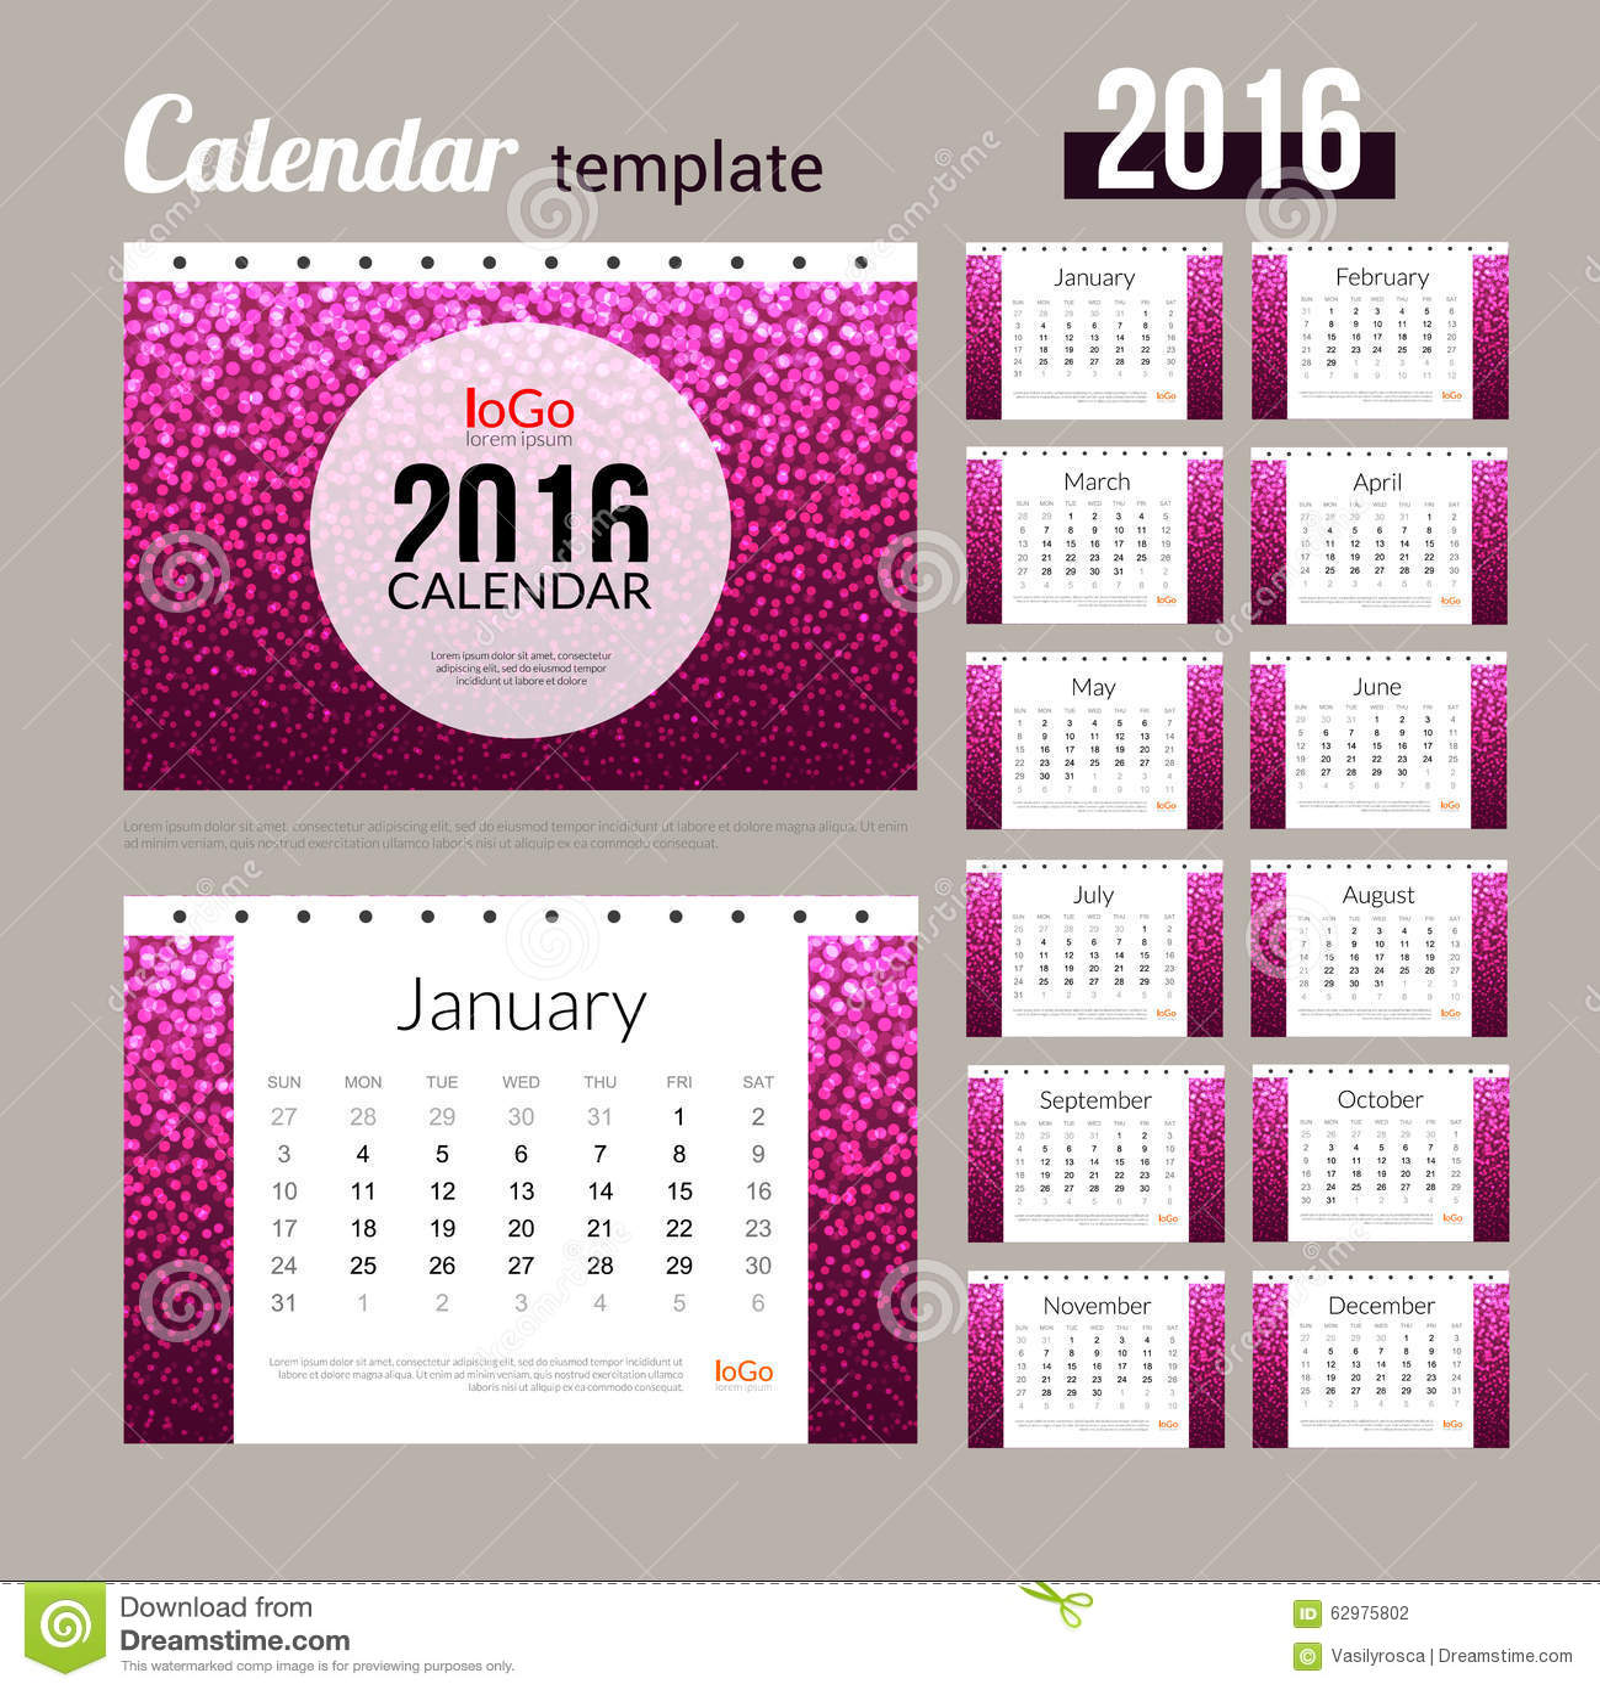 Calendar Design Pattern : Desk calendar design template with abstract stock